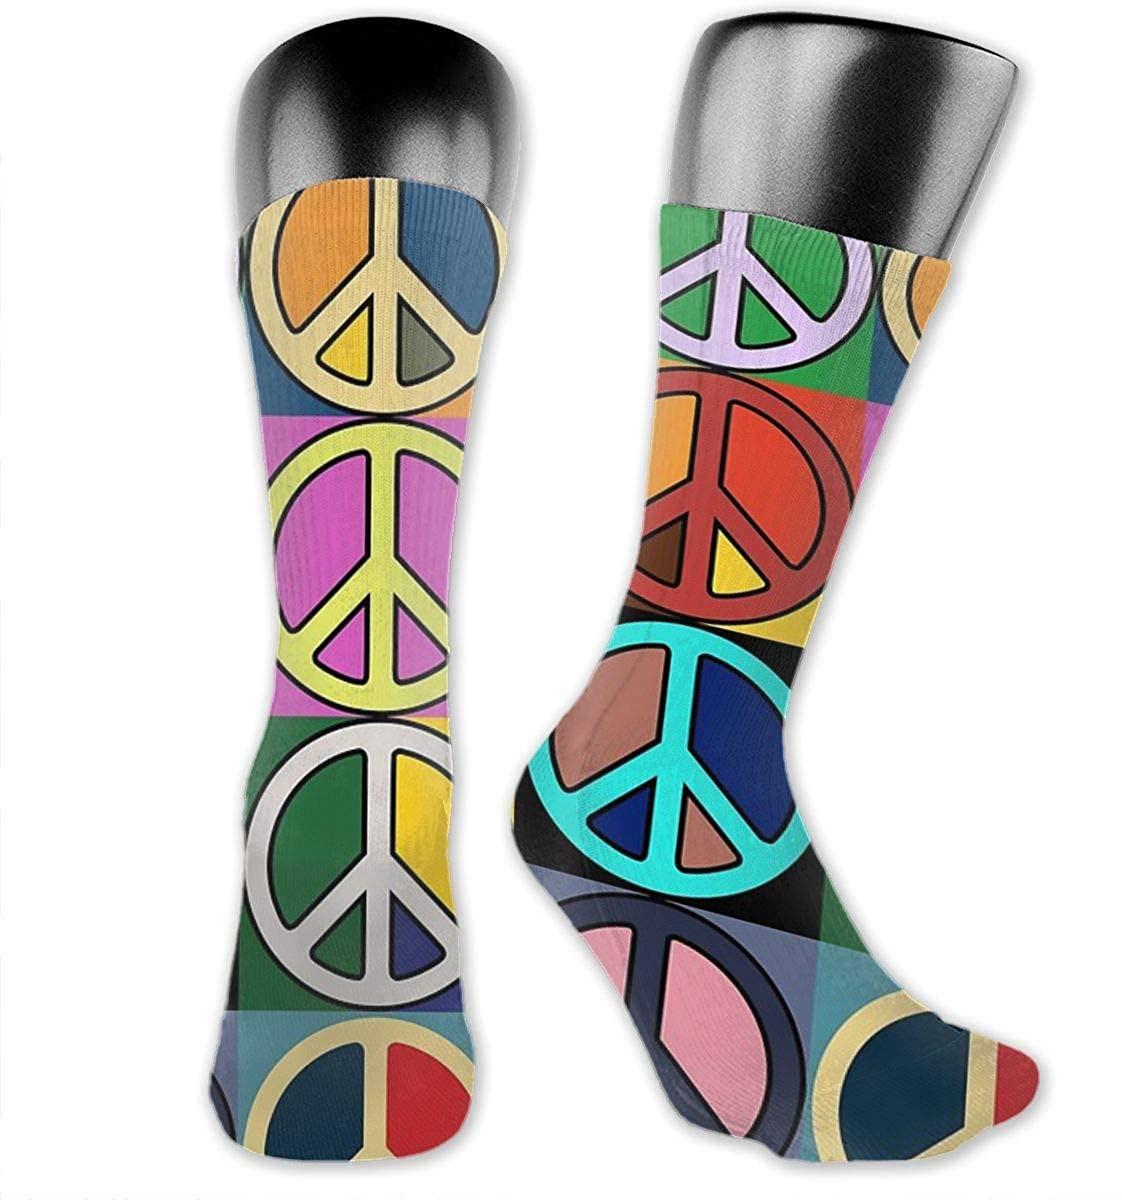 Unisex Crazy Funny Peace Mosaic Socks Colorful Running Travel Socks Novelty Casual Crew Socks